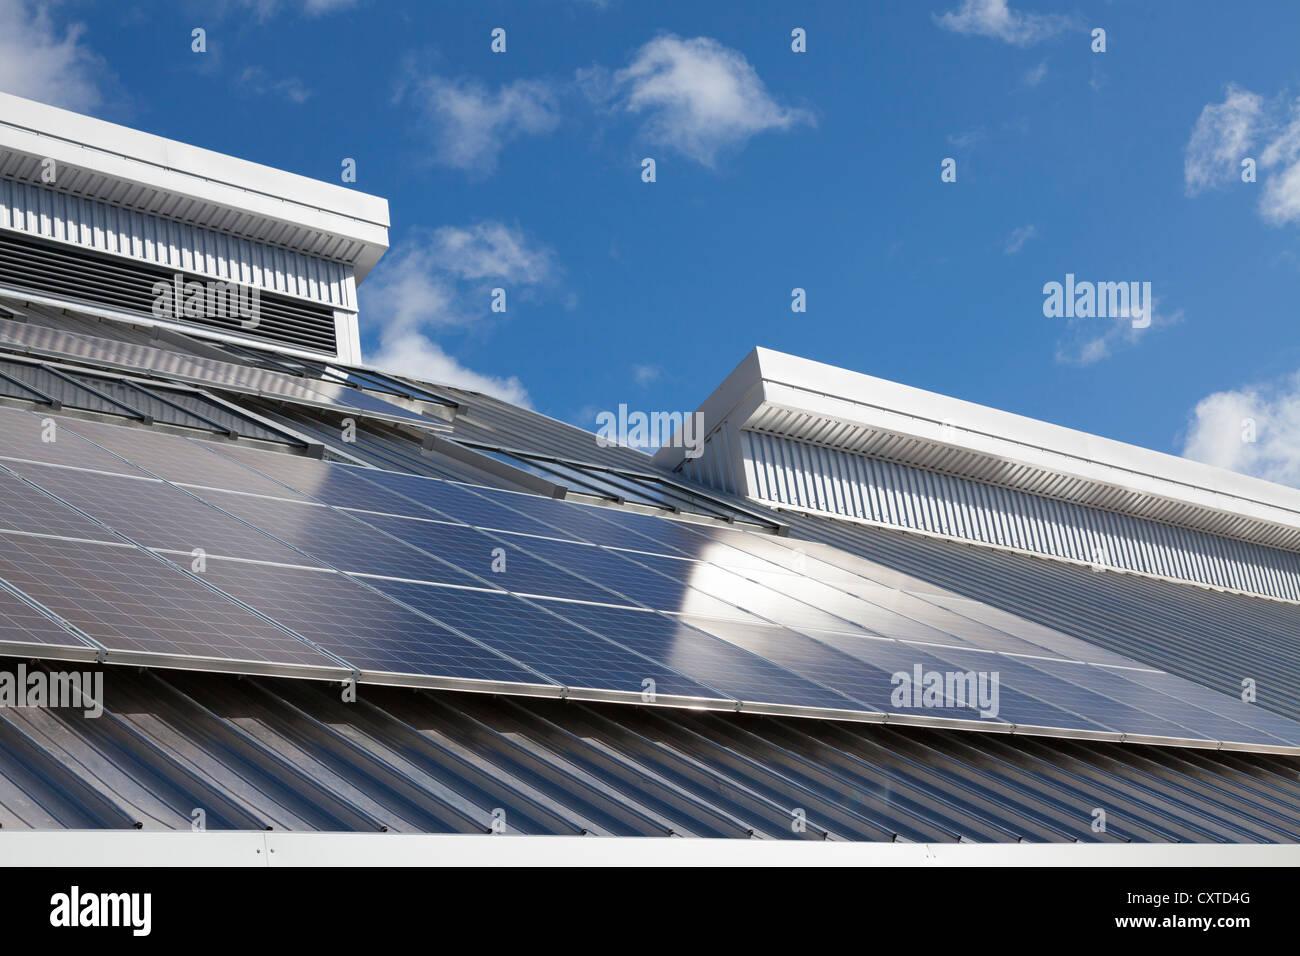 Solar panels on school roof against blue sky in sunshine - Stock Image